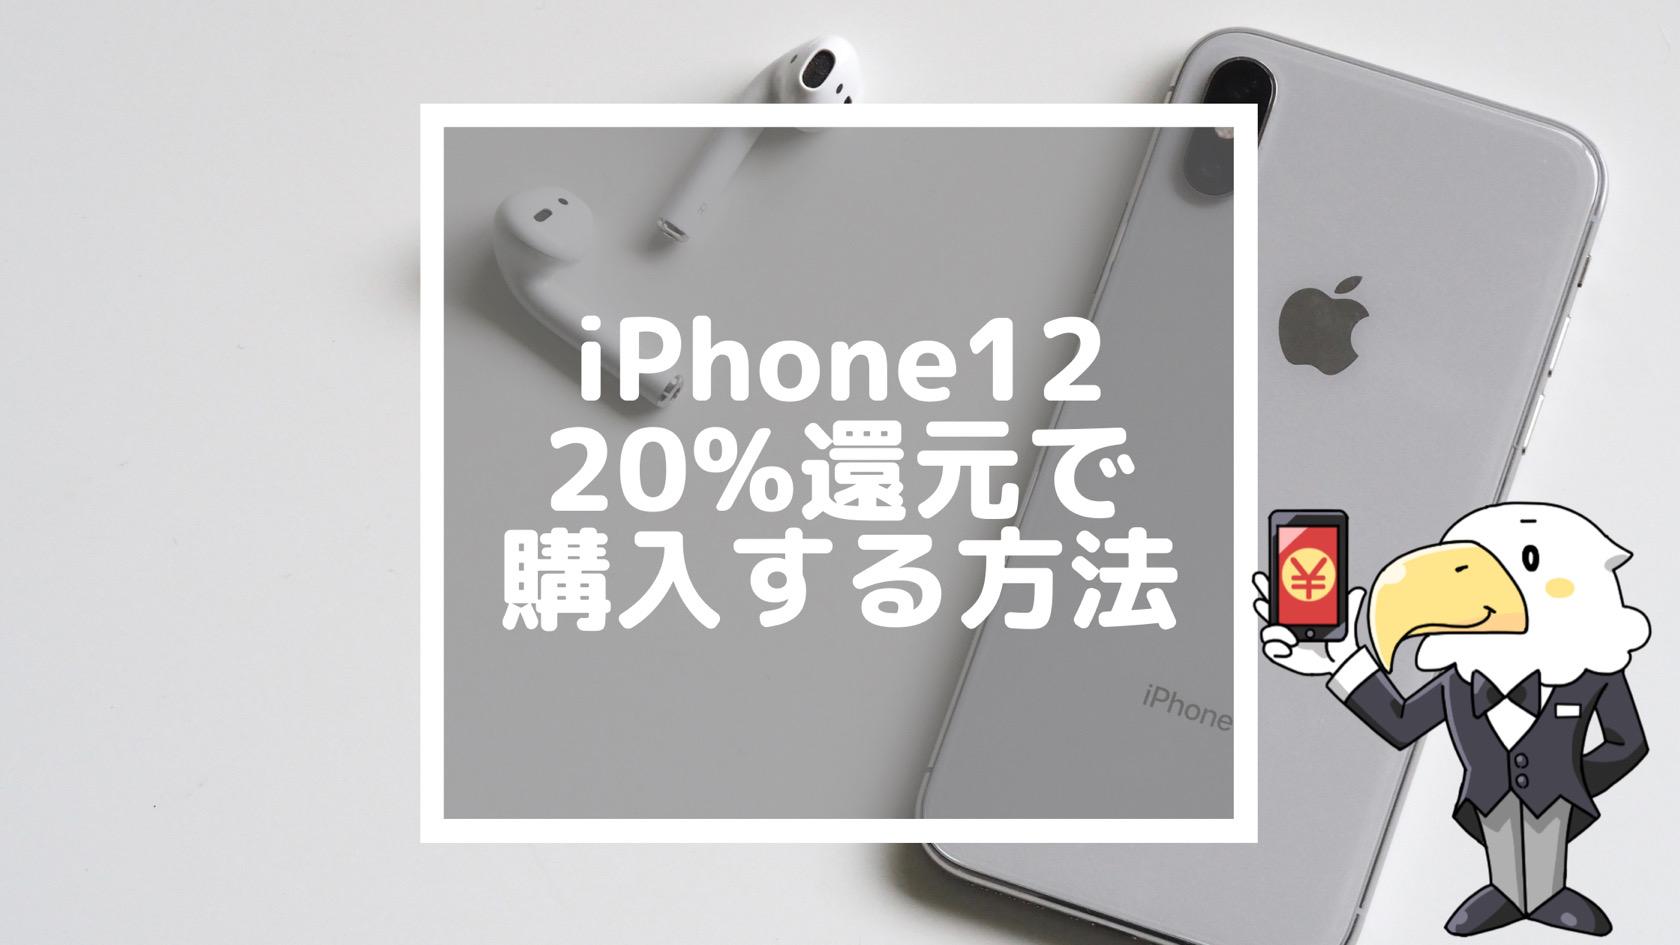 iPhone12 三井住友カード アイコン